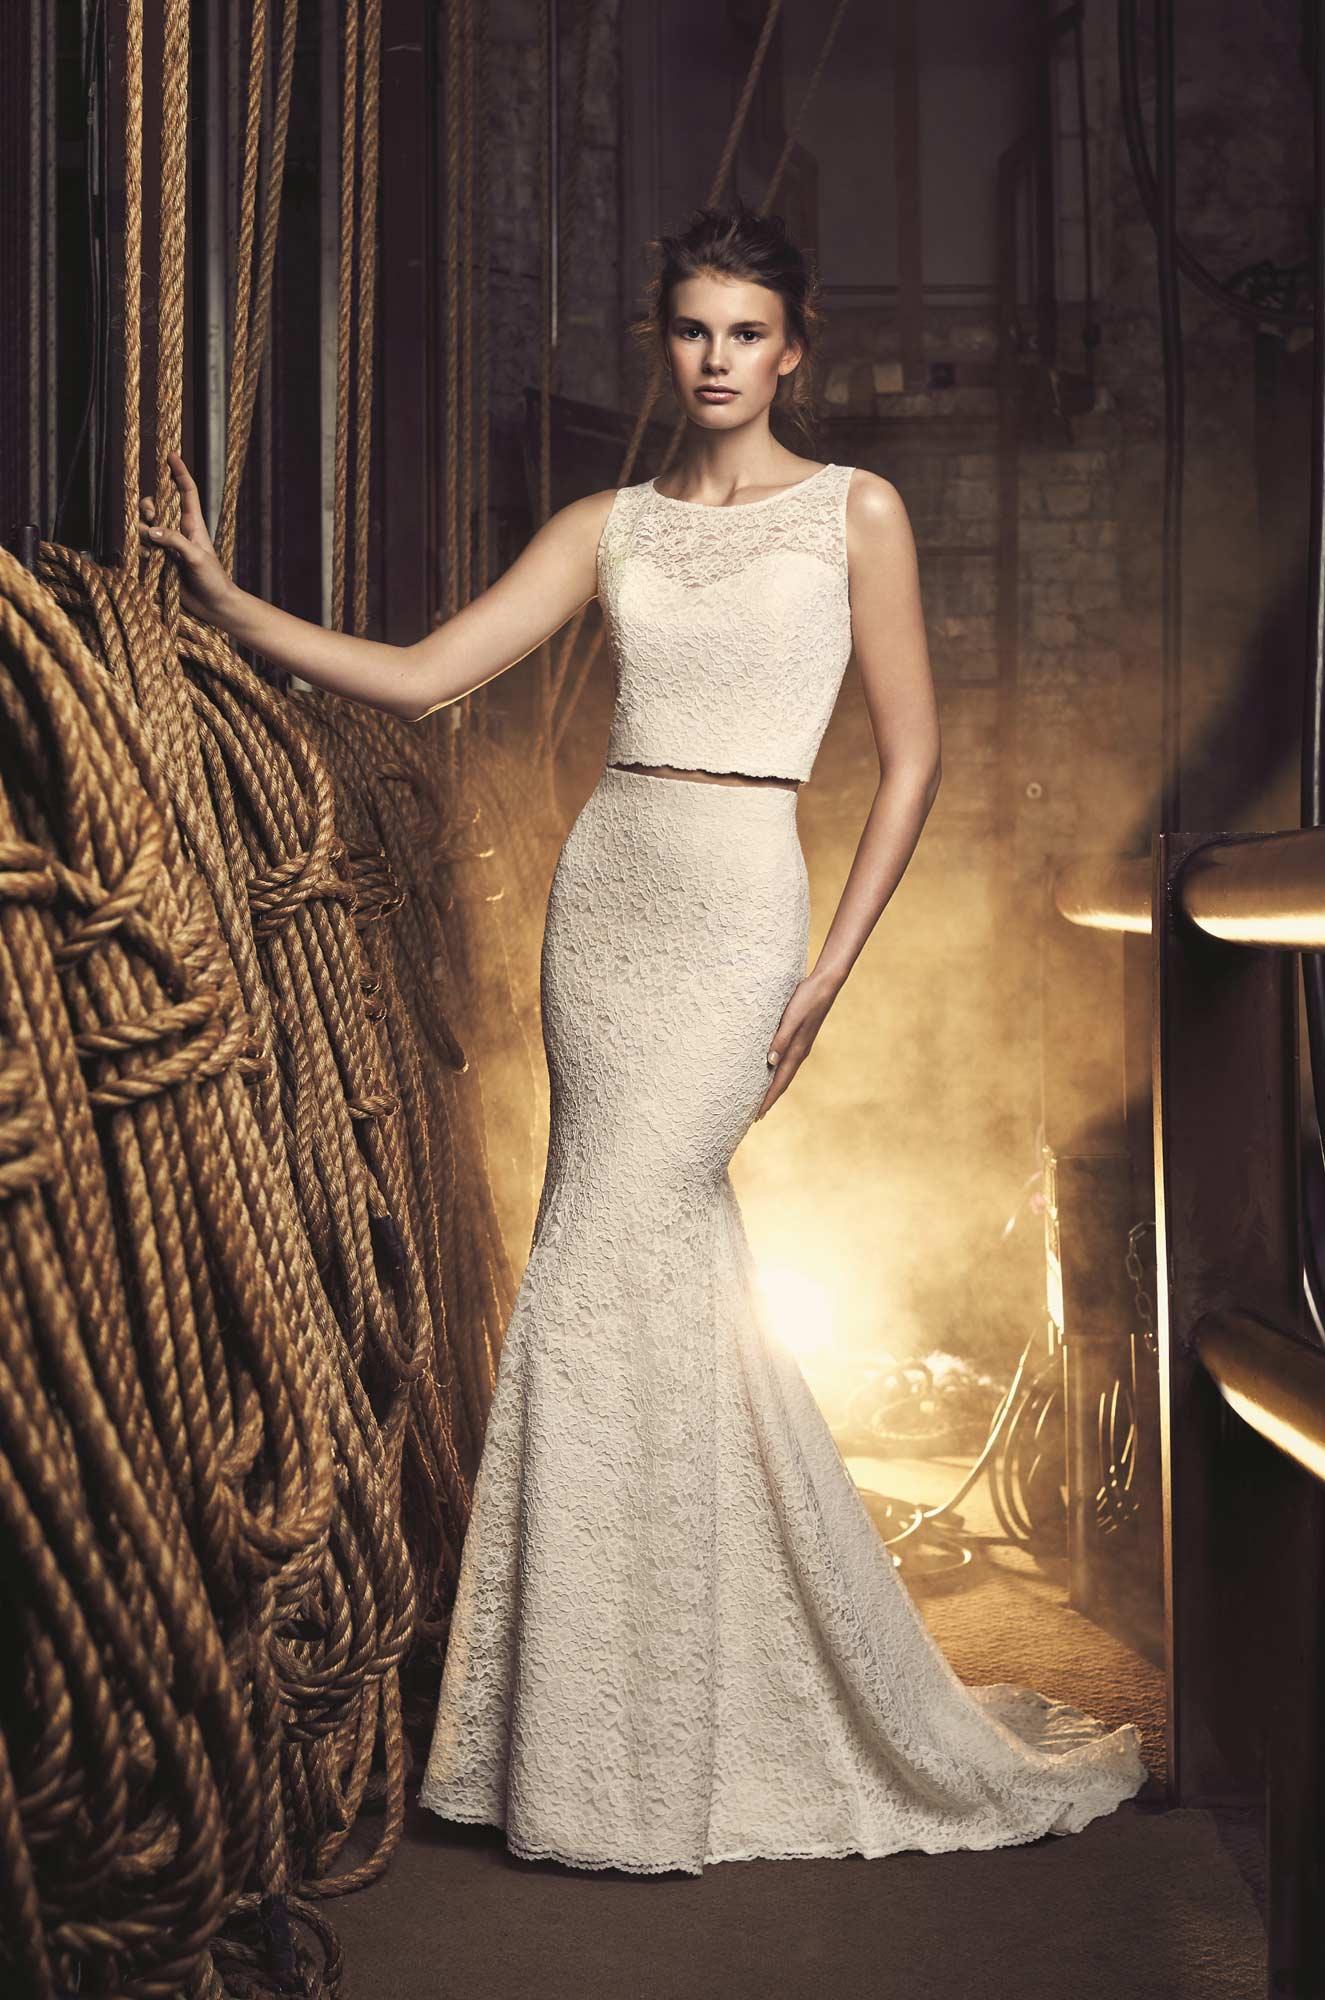 Cropped Lace Wedding Dress - Style #2075 | Mikaella Bridal